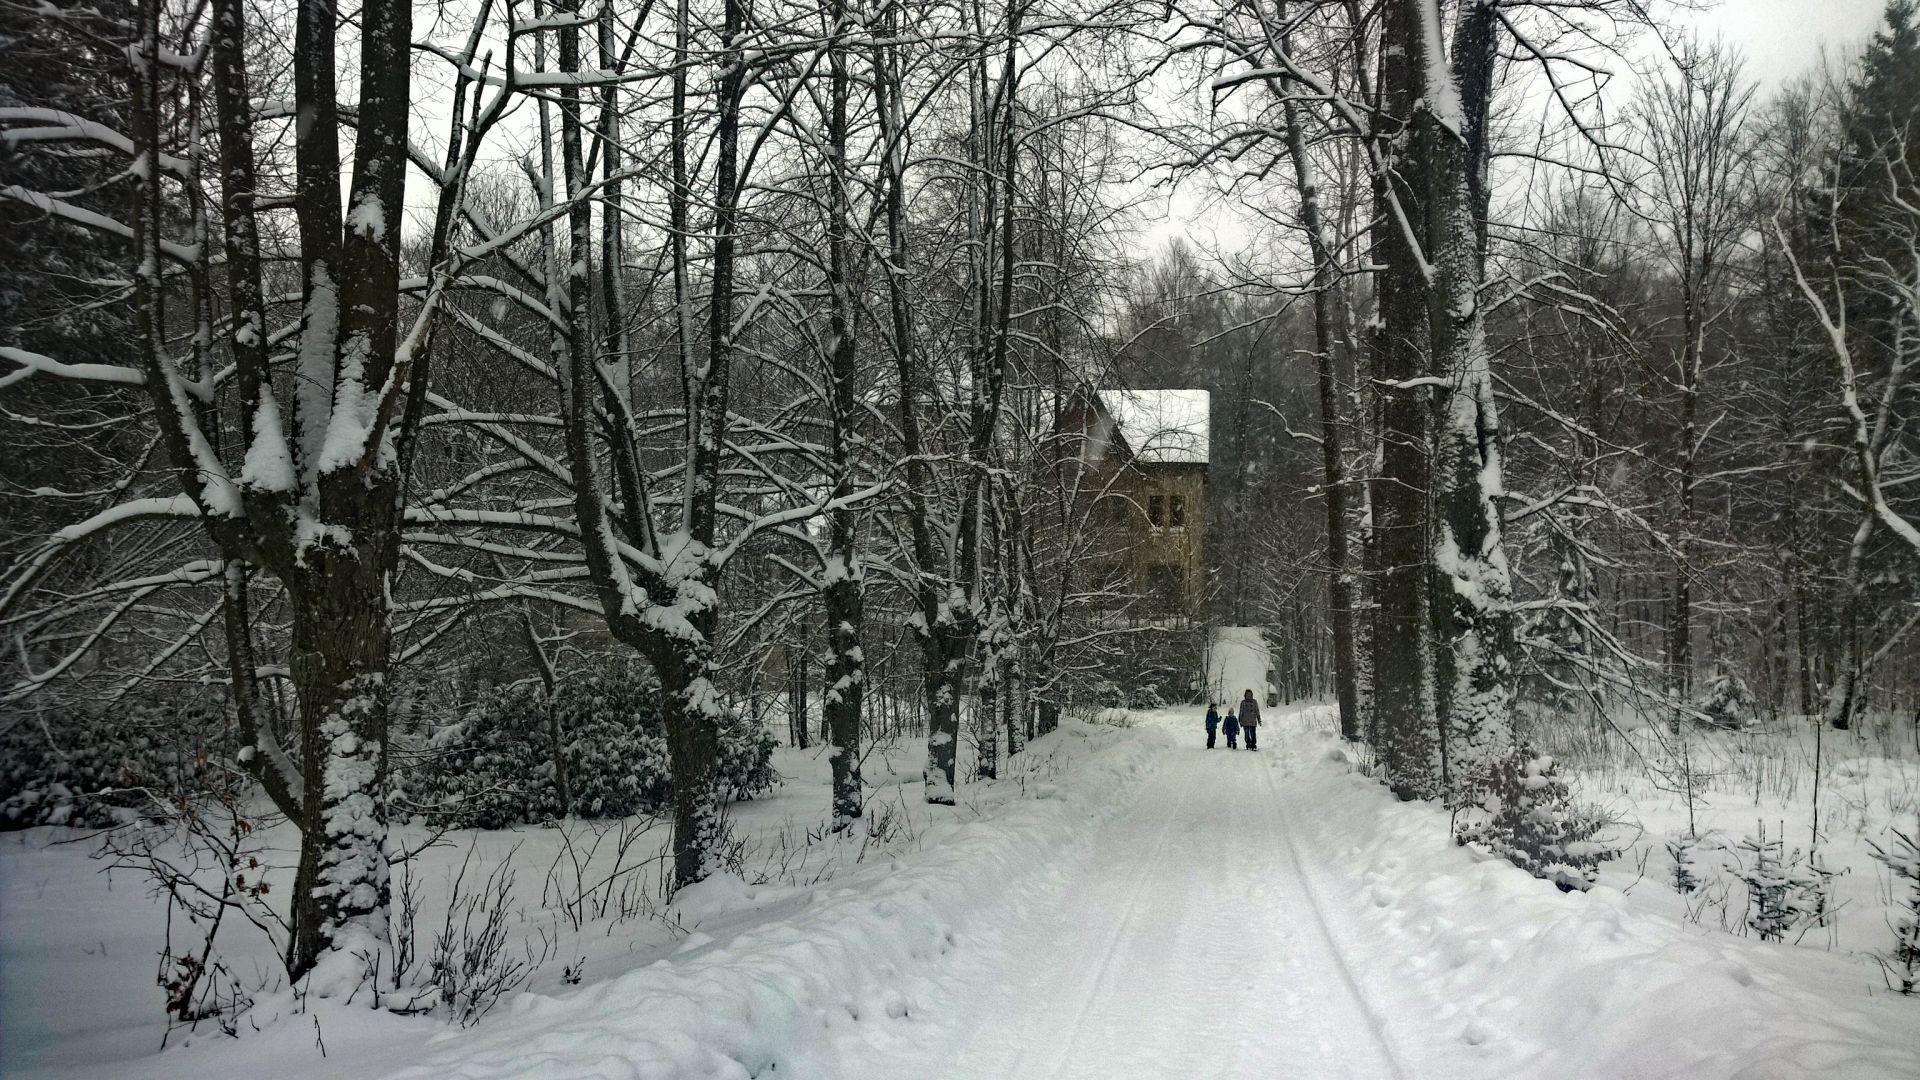 Vánoční pozdrav 2020 z Karlova údolí